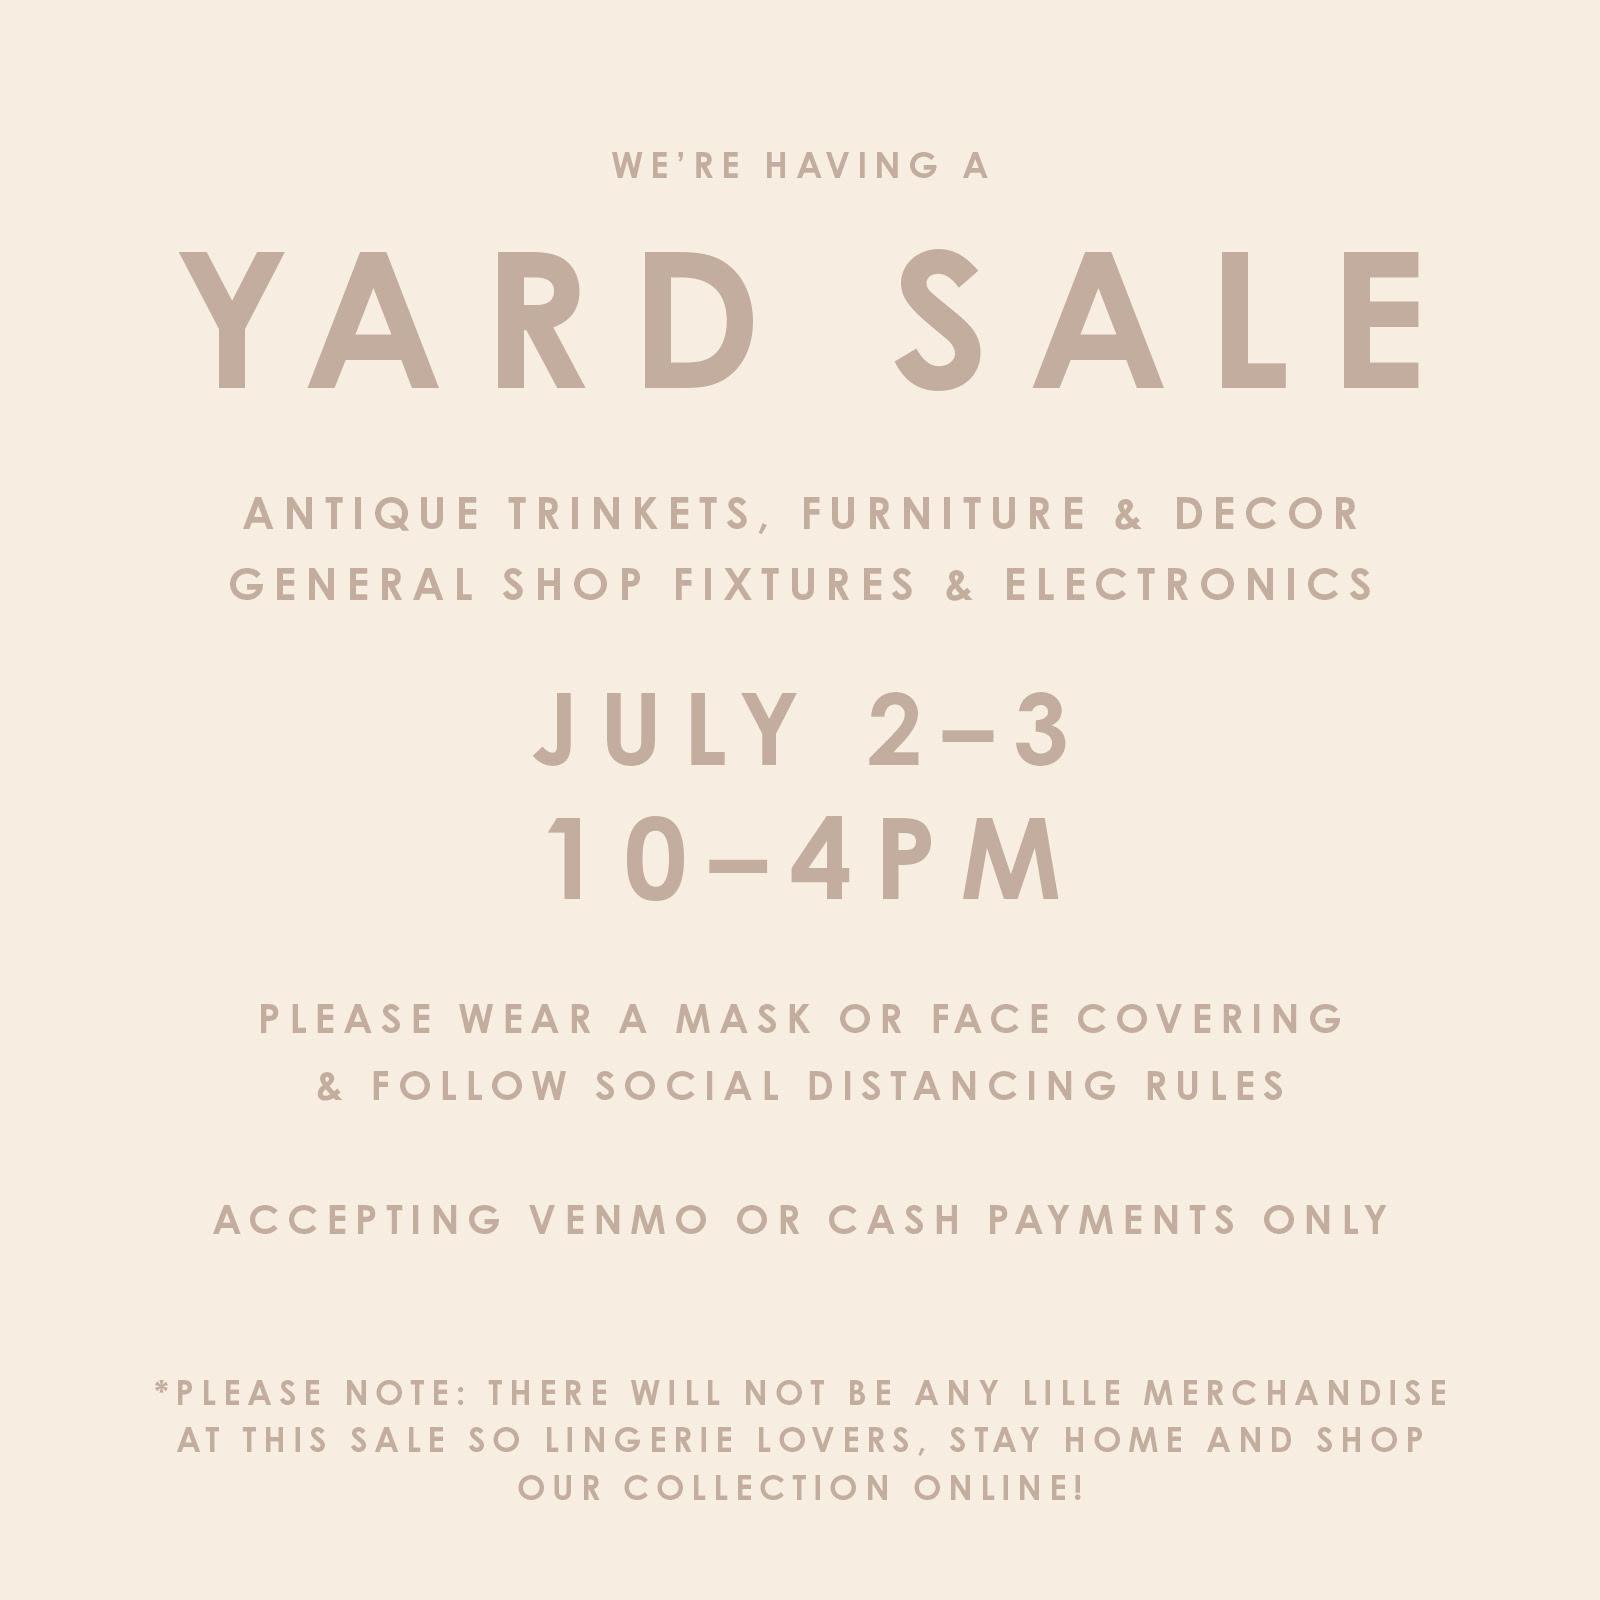 Lille Yard Sale 7/2 - 7/3